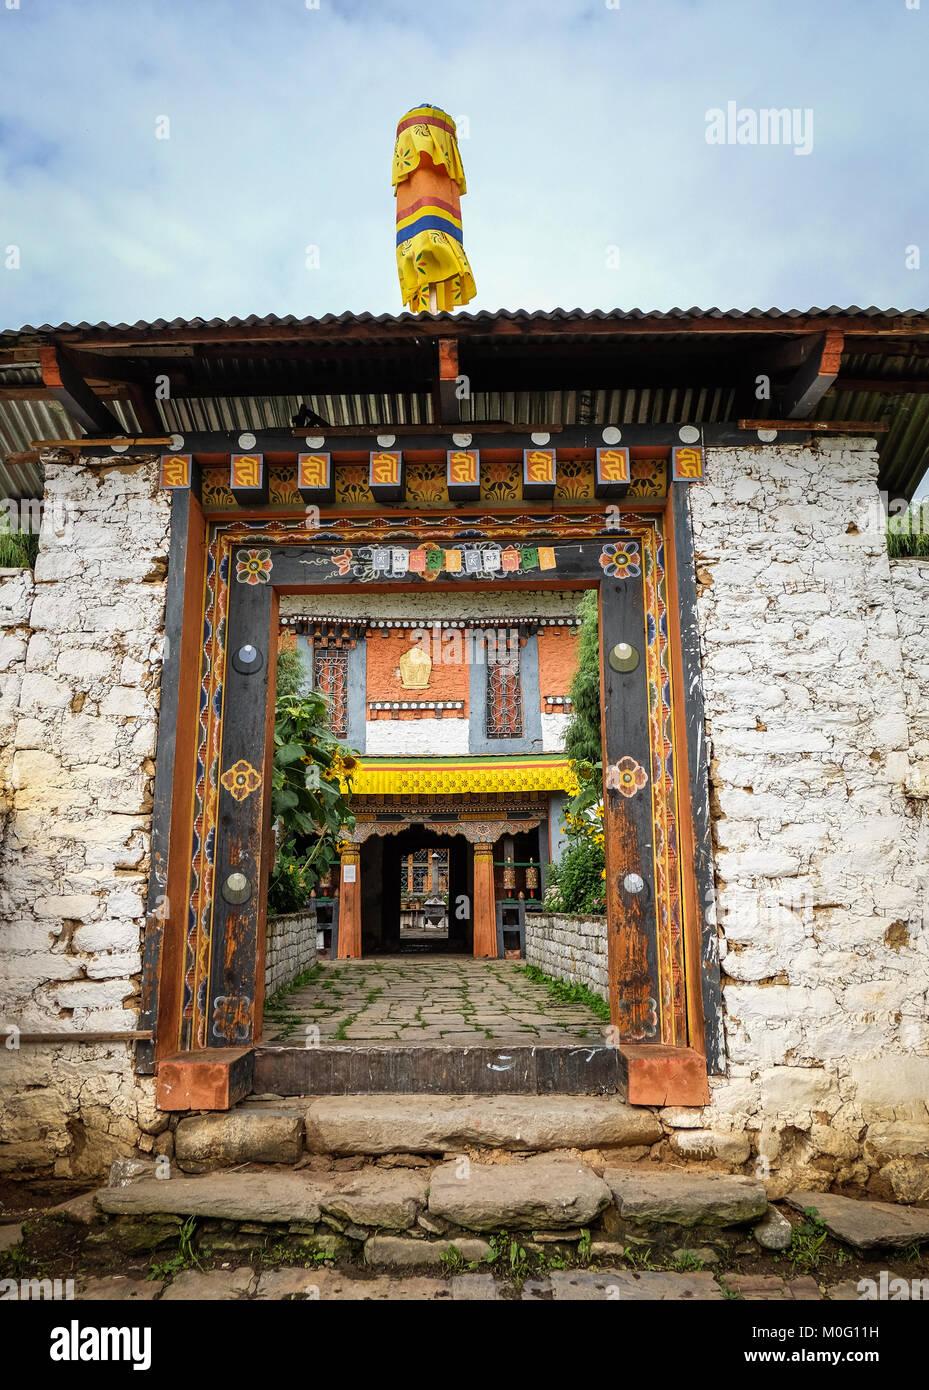 Thimphu, Bhutan - Aug 30, 2015. The gate of Buddhist monastery in Thimphu, Bhutan. It is believed that Buddhism - Stock Image